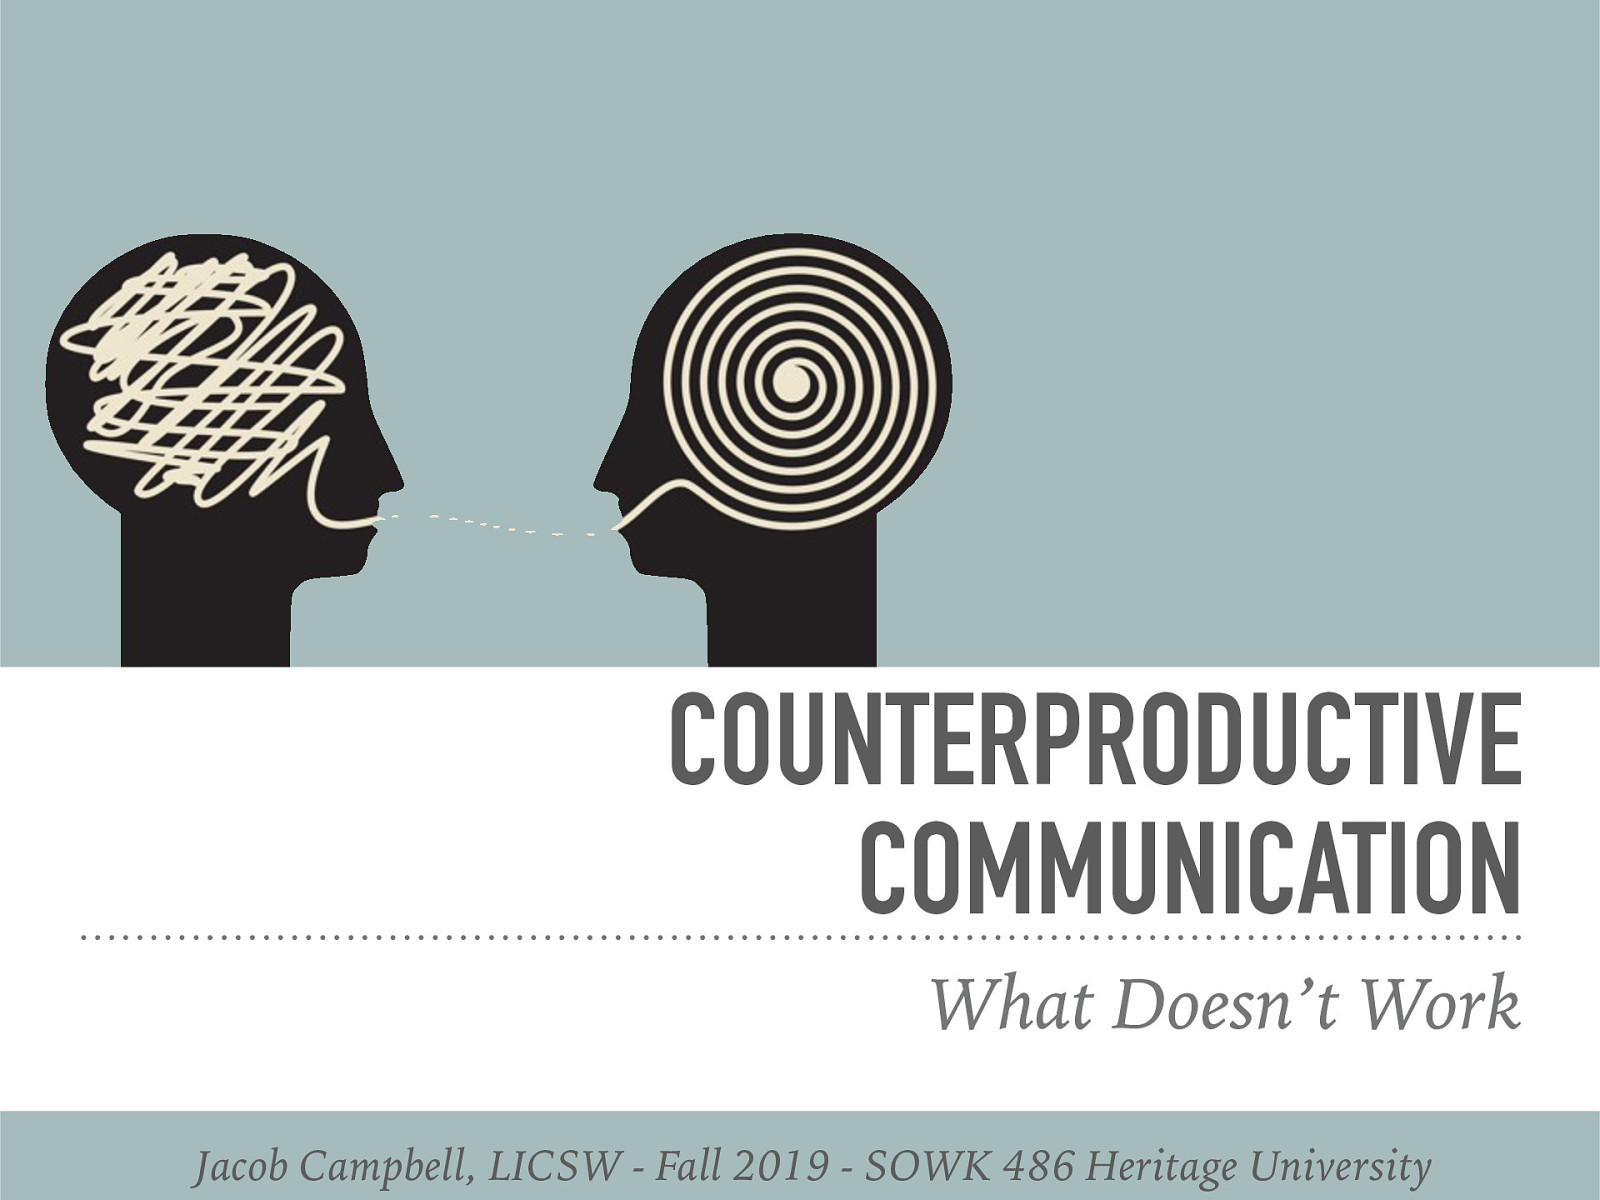 Week 07 - Counterproductive Communication